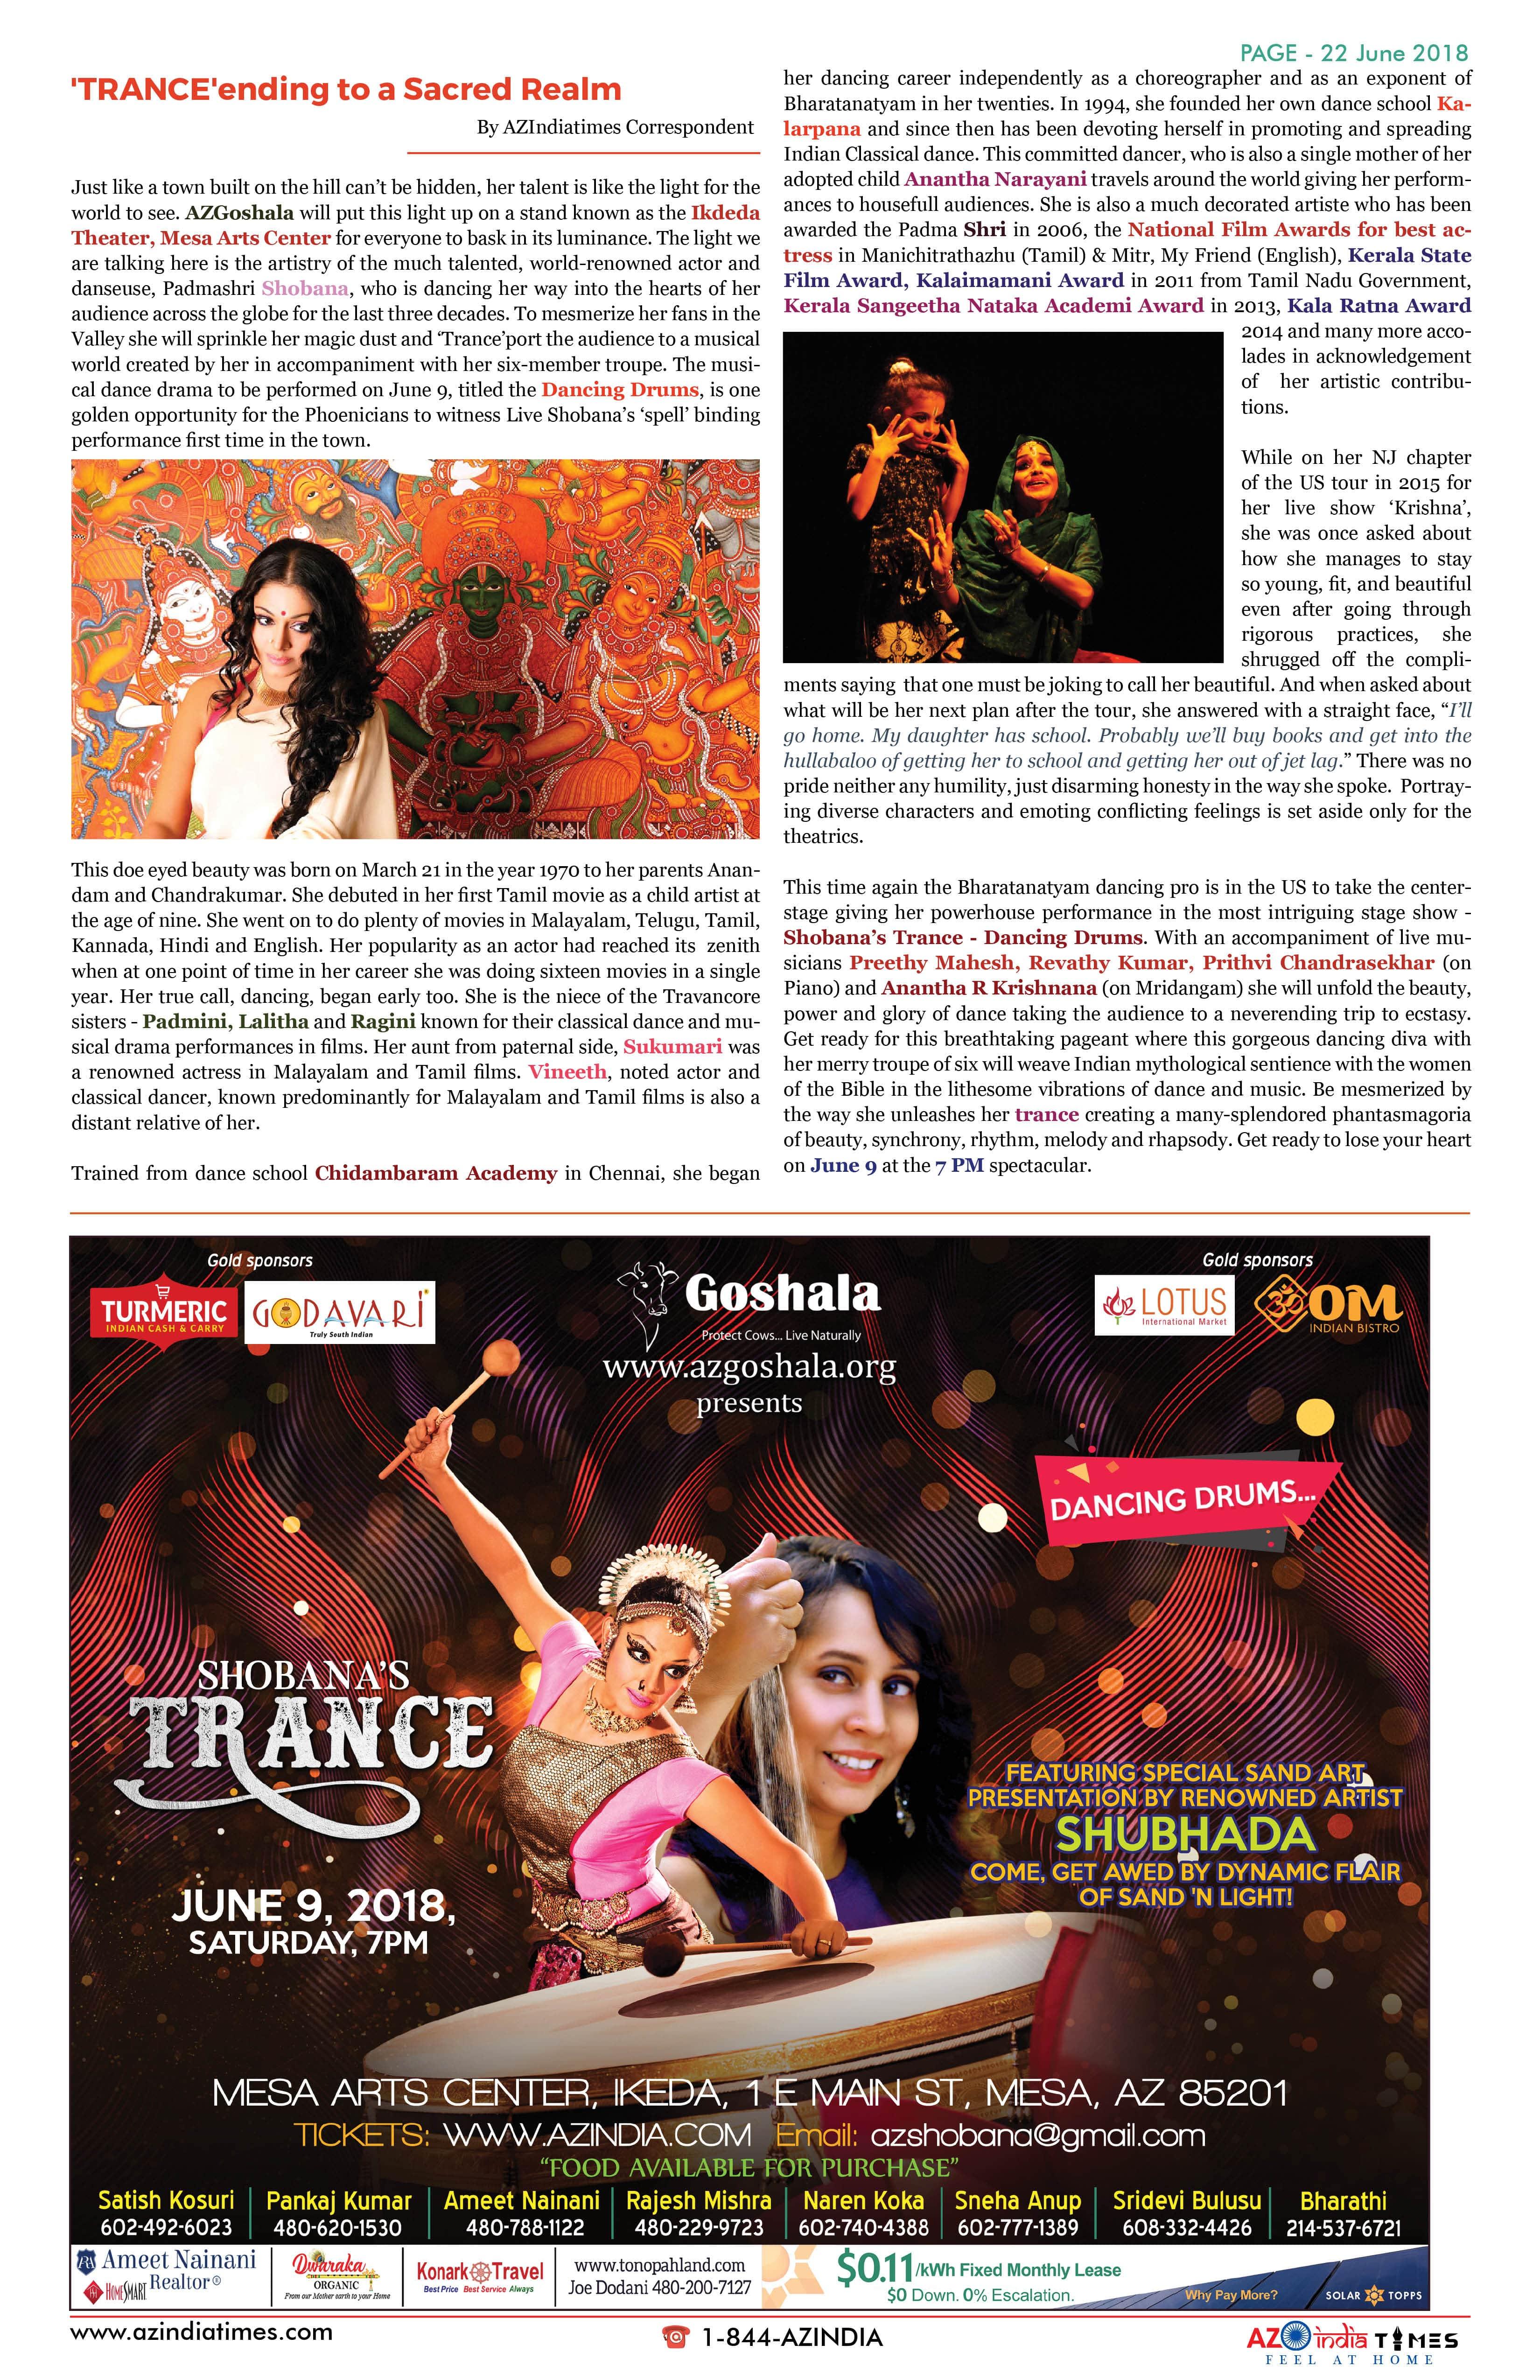 AZ INDIA JUNE EDITION 22